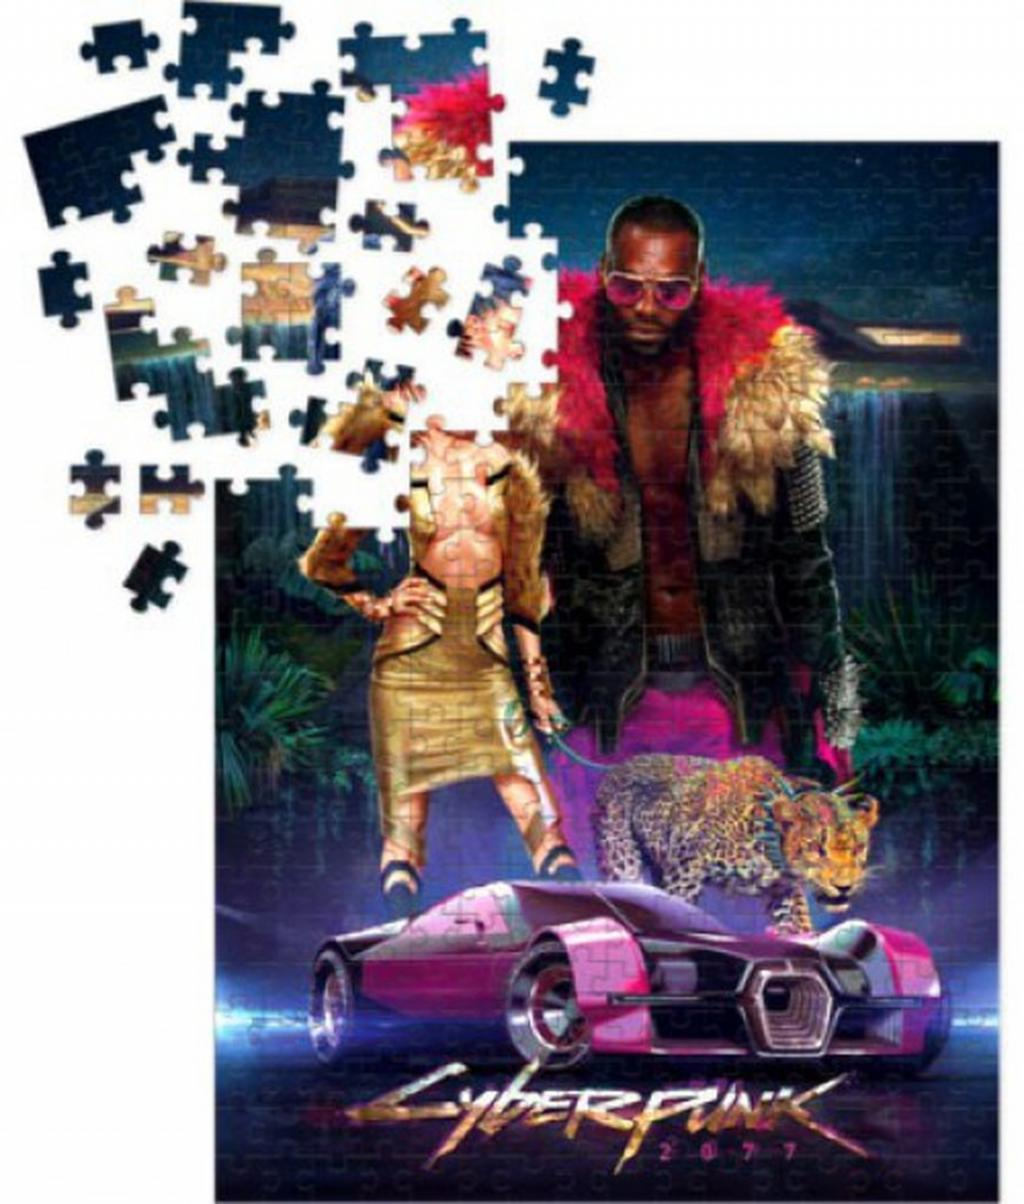 CYBERPUNK 2077 - Puzzle 1000P - NeoKitsch_1